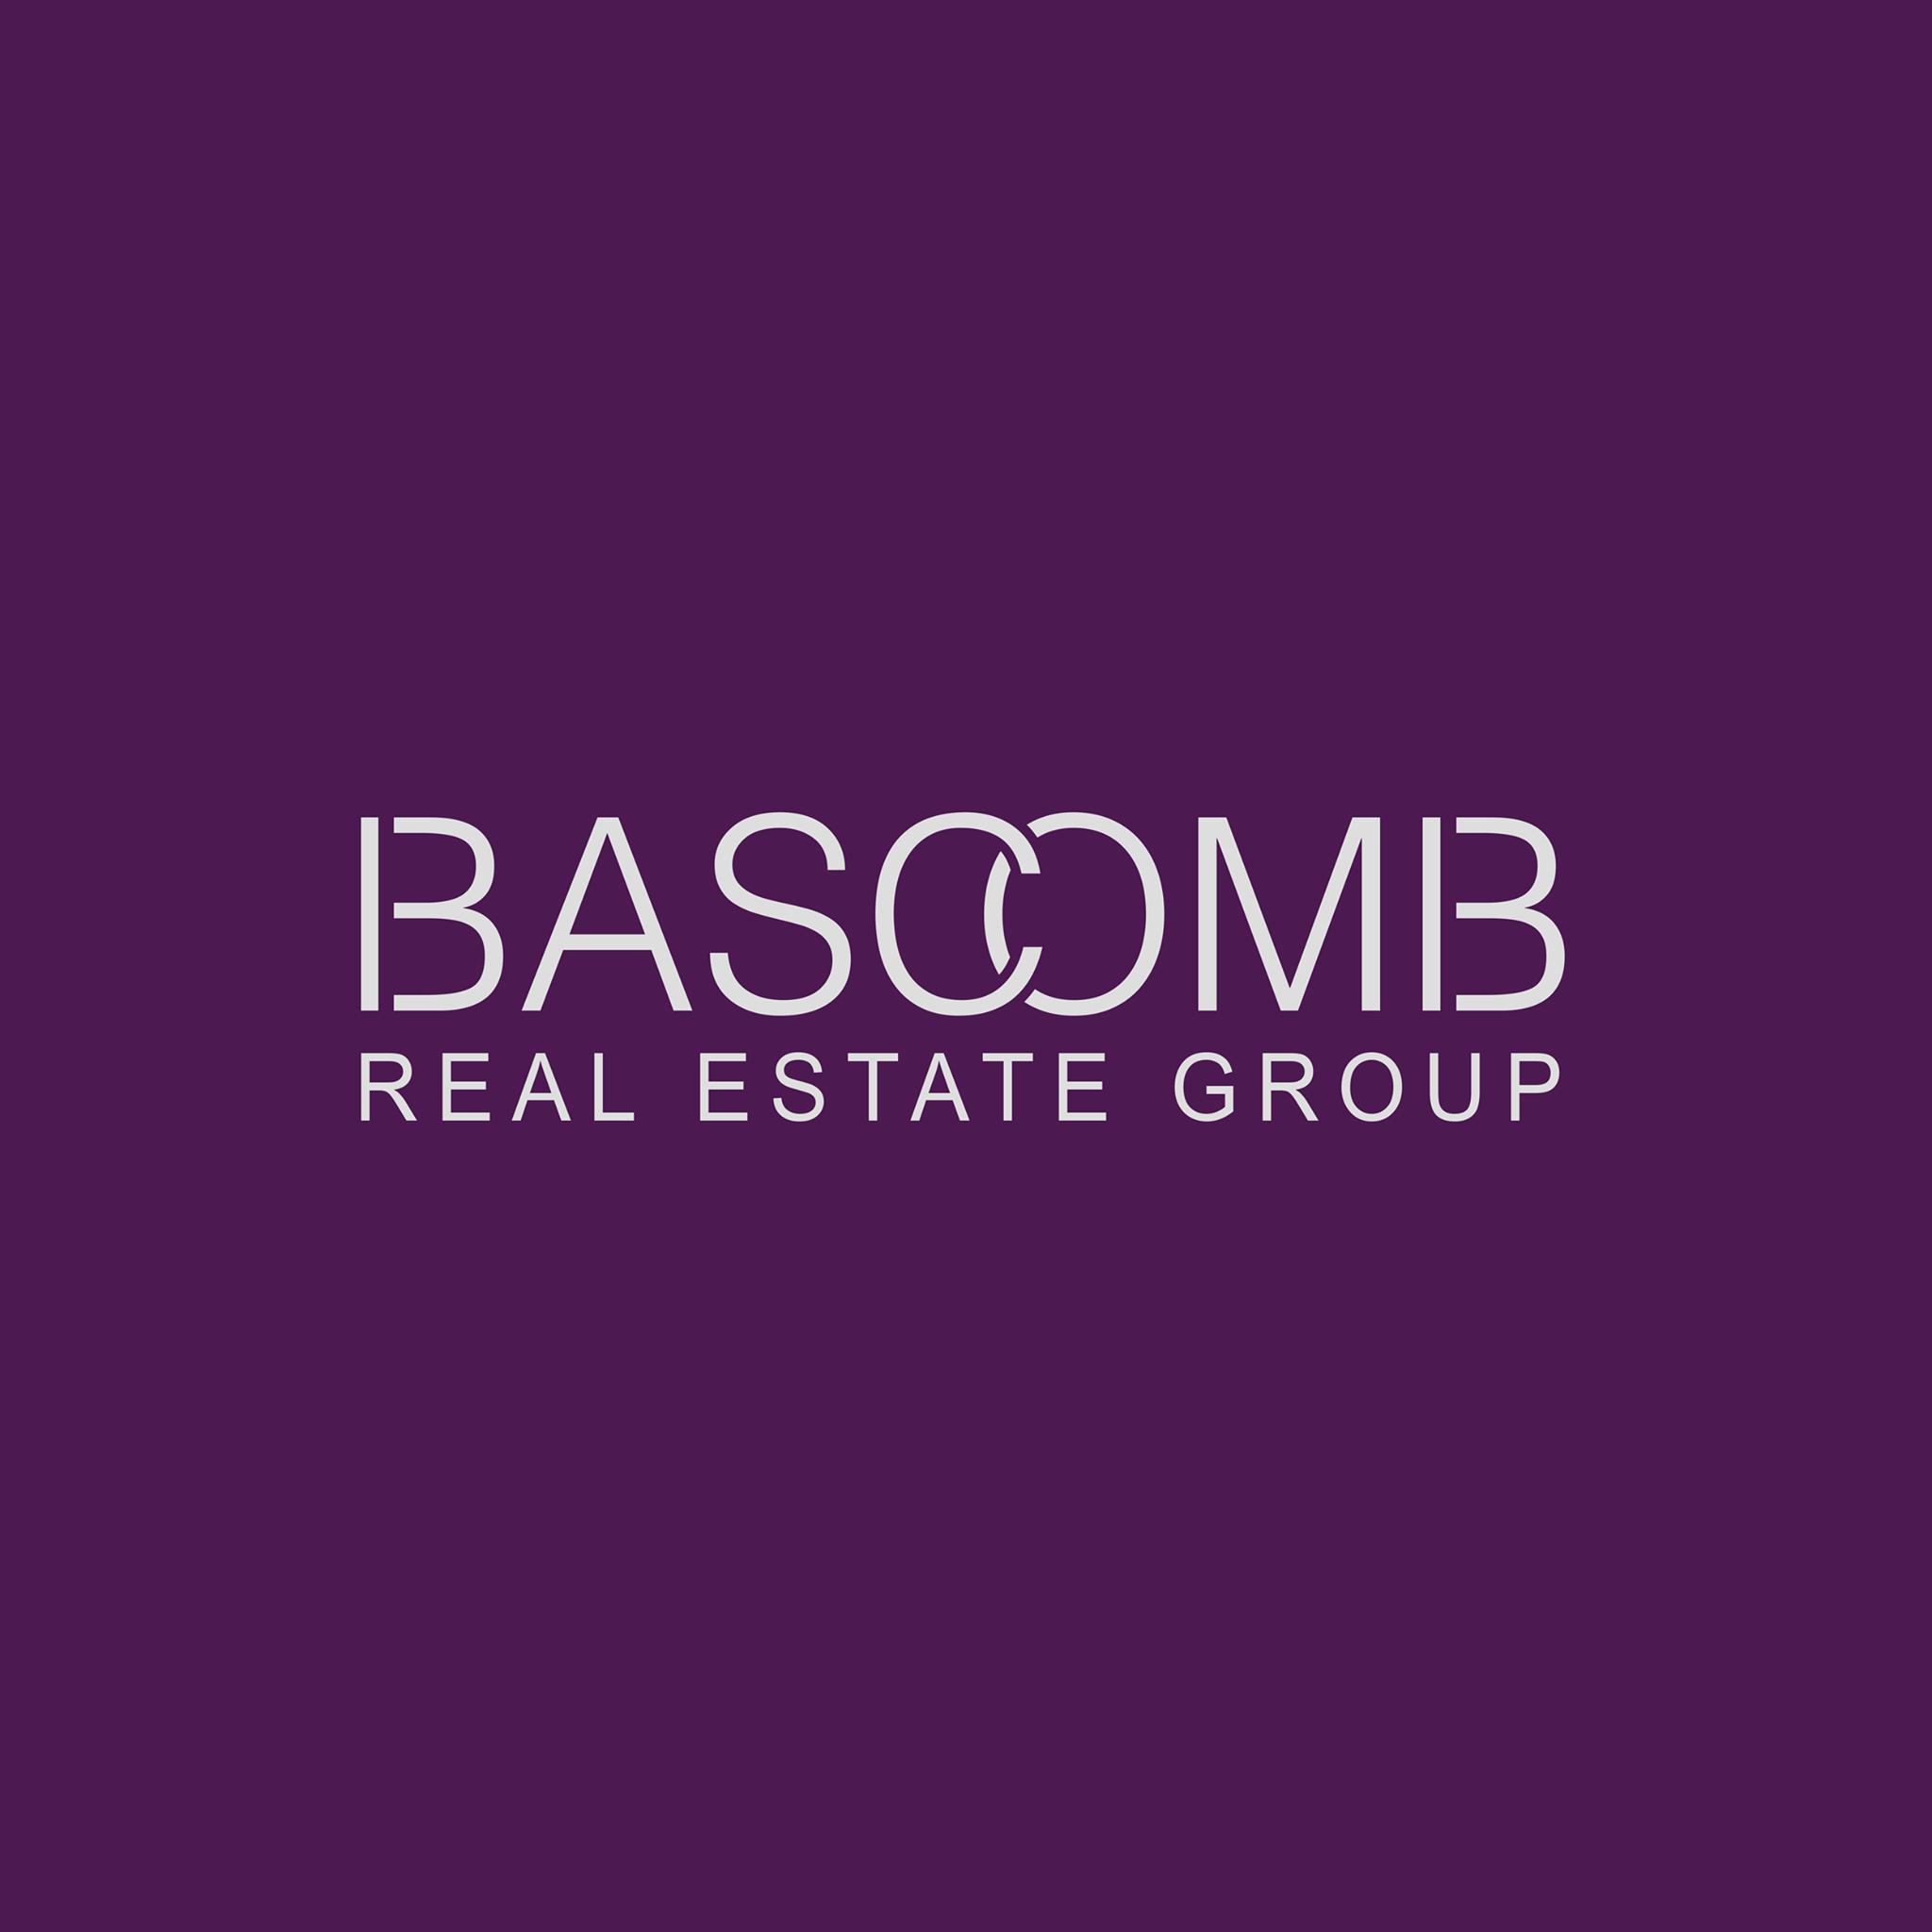 Real Estate Brokerage Firm - Image via: https://bascombrealestate.com/